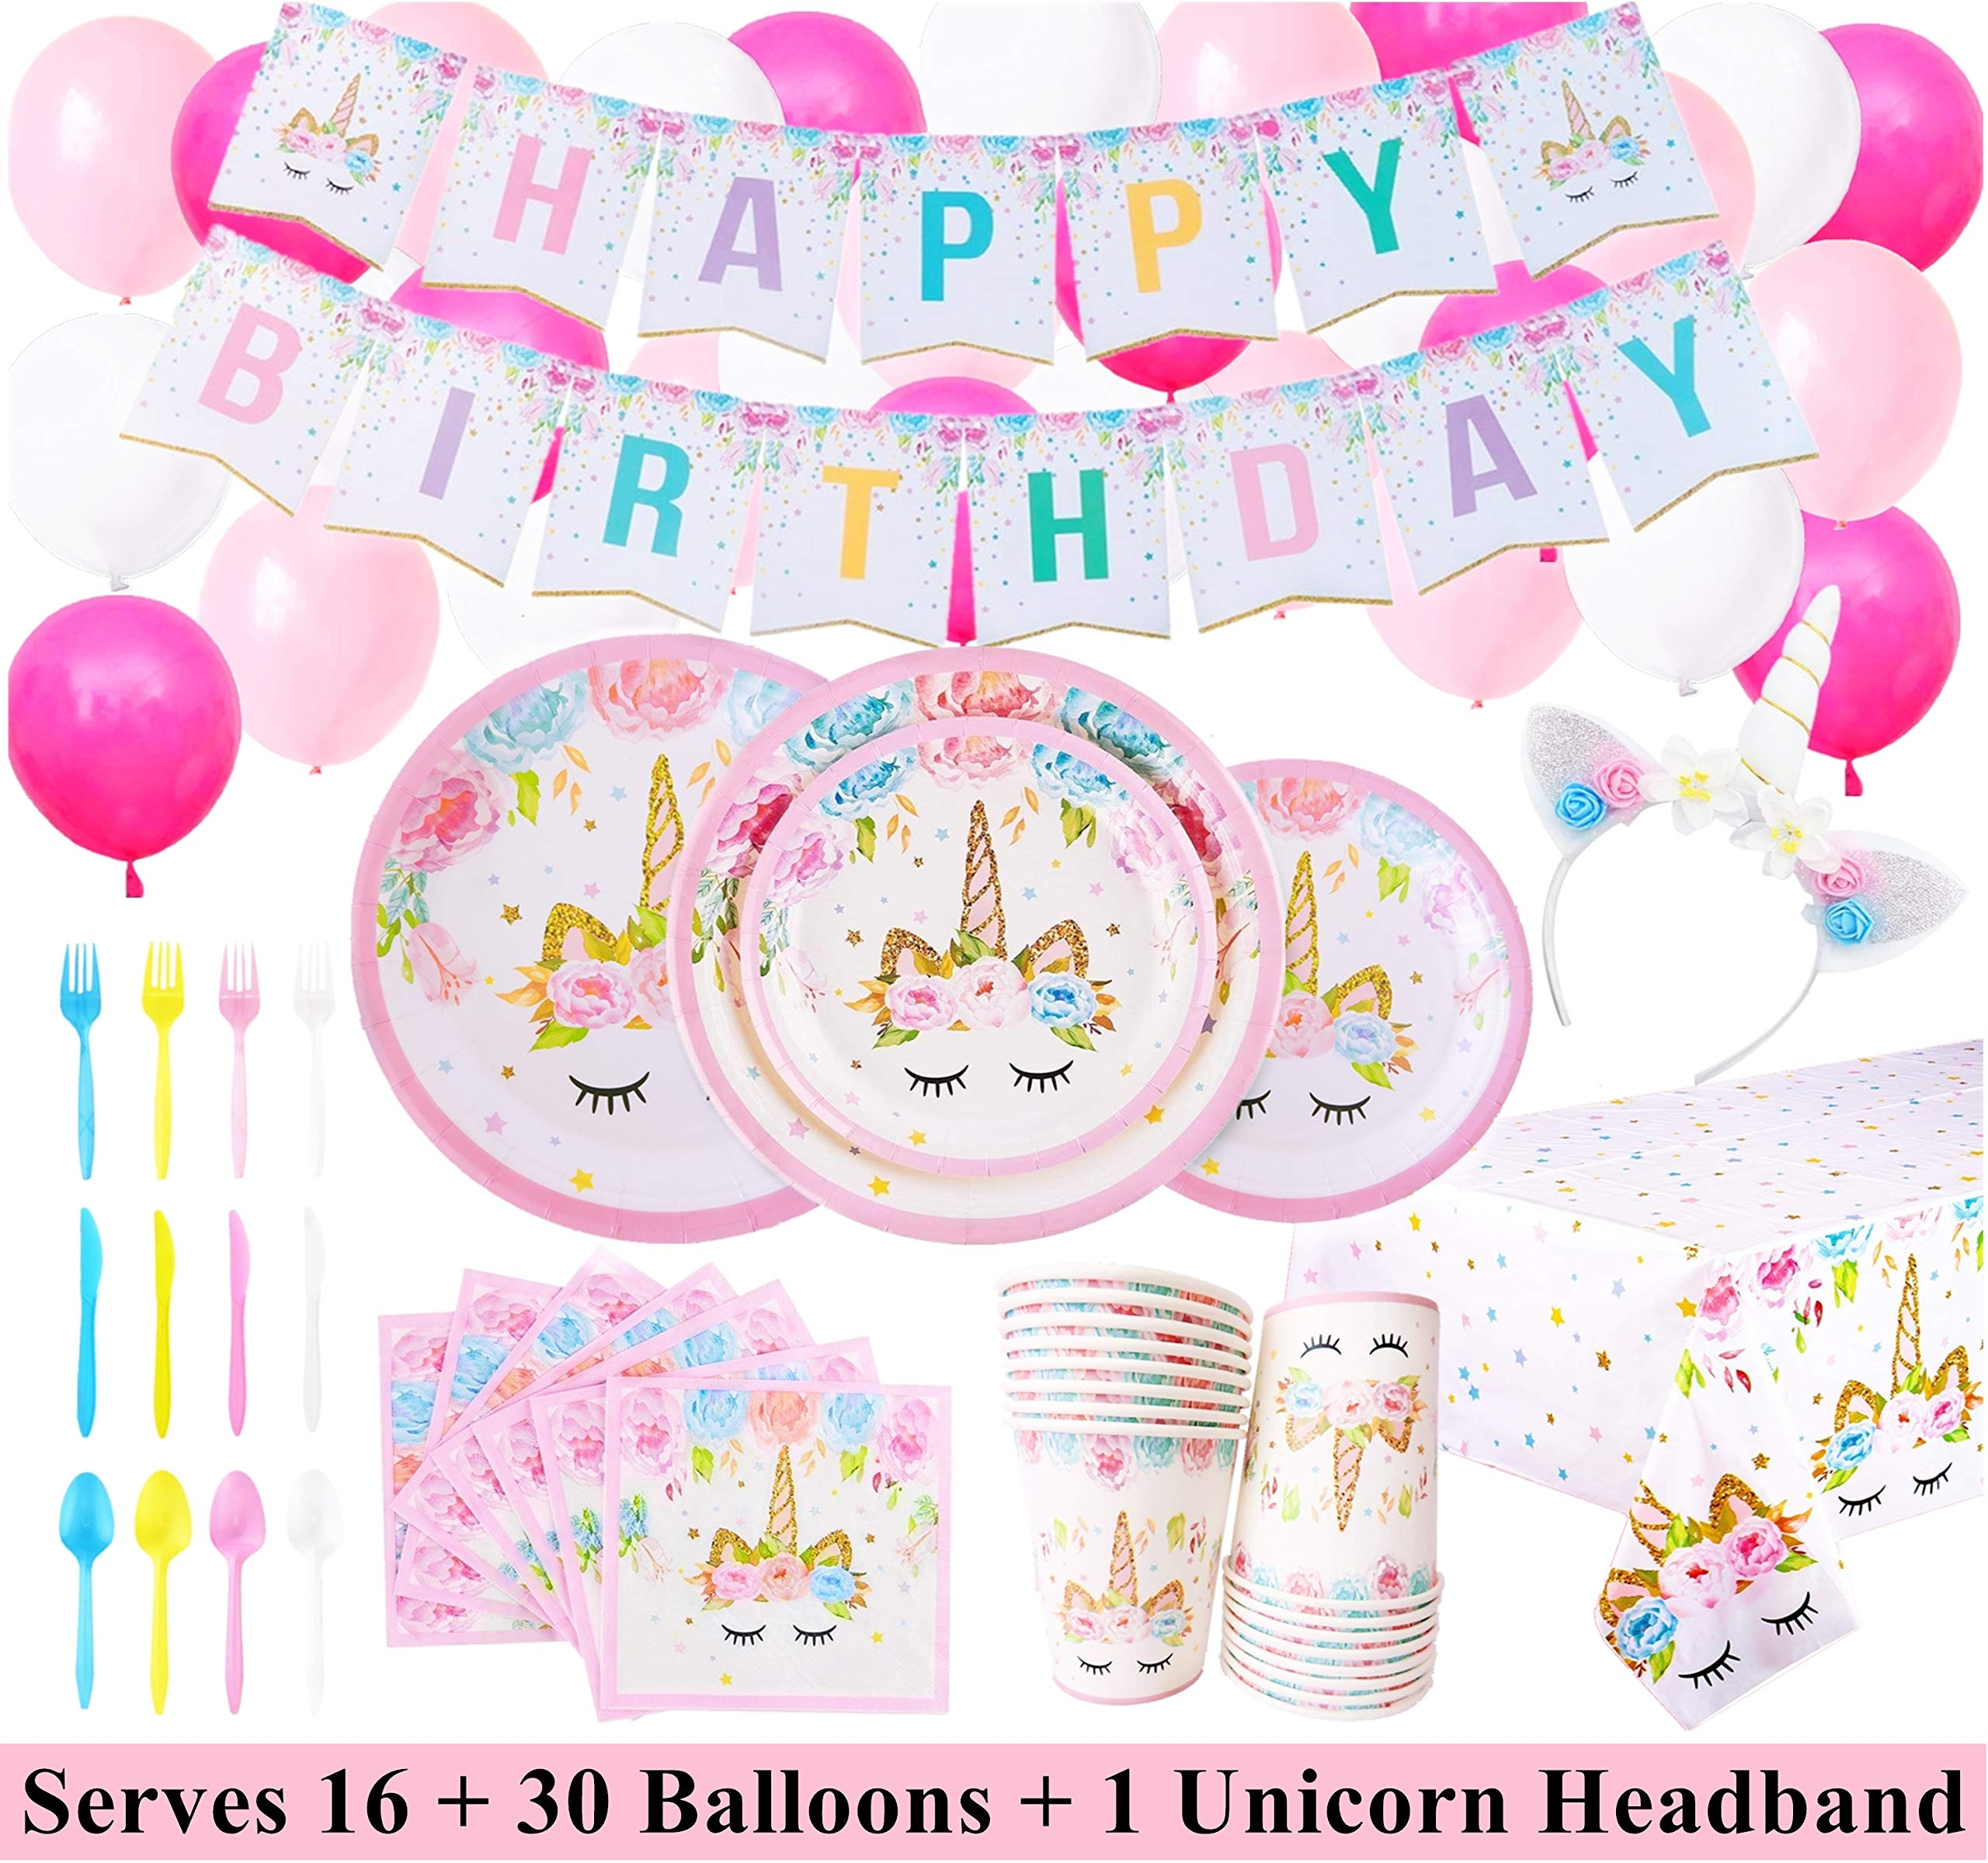 Unicorn Party Supplies Set with BONUS Glittery Unicorn Headband and 30 Balloons   145 Piece Disposable Unicorn Themed… 3